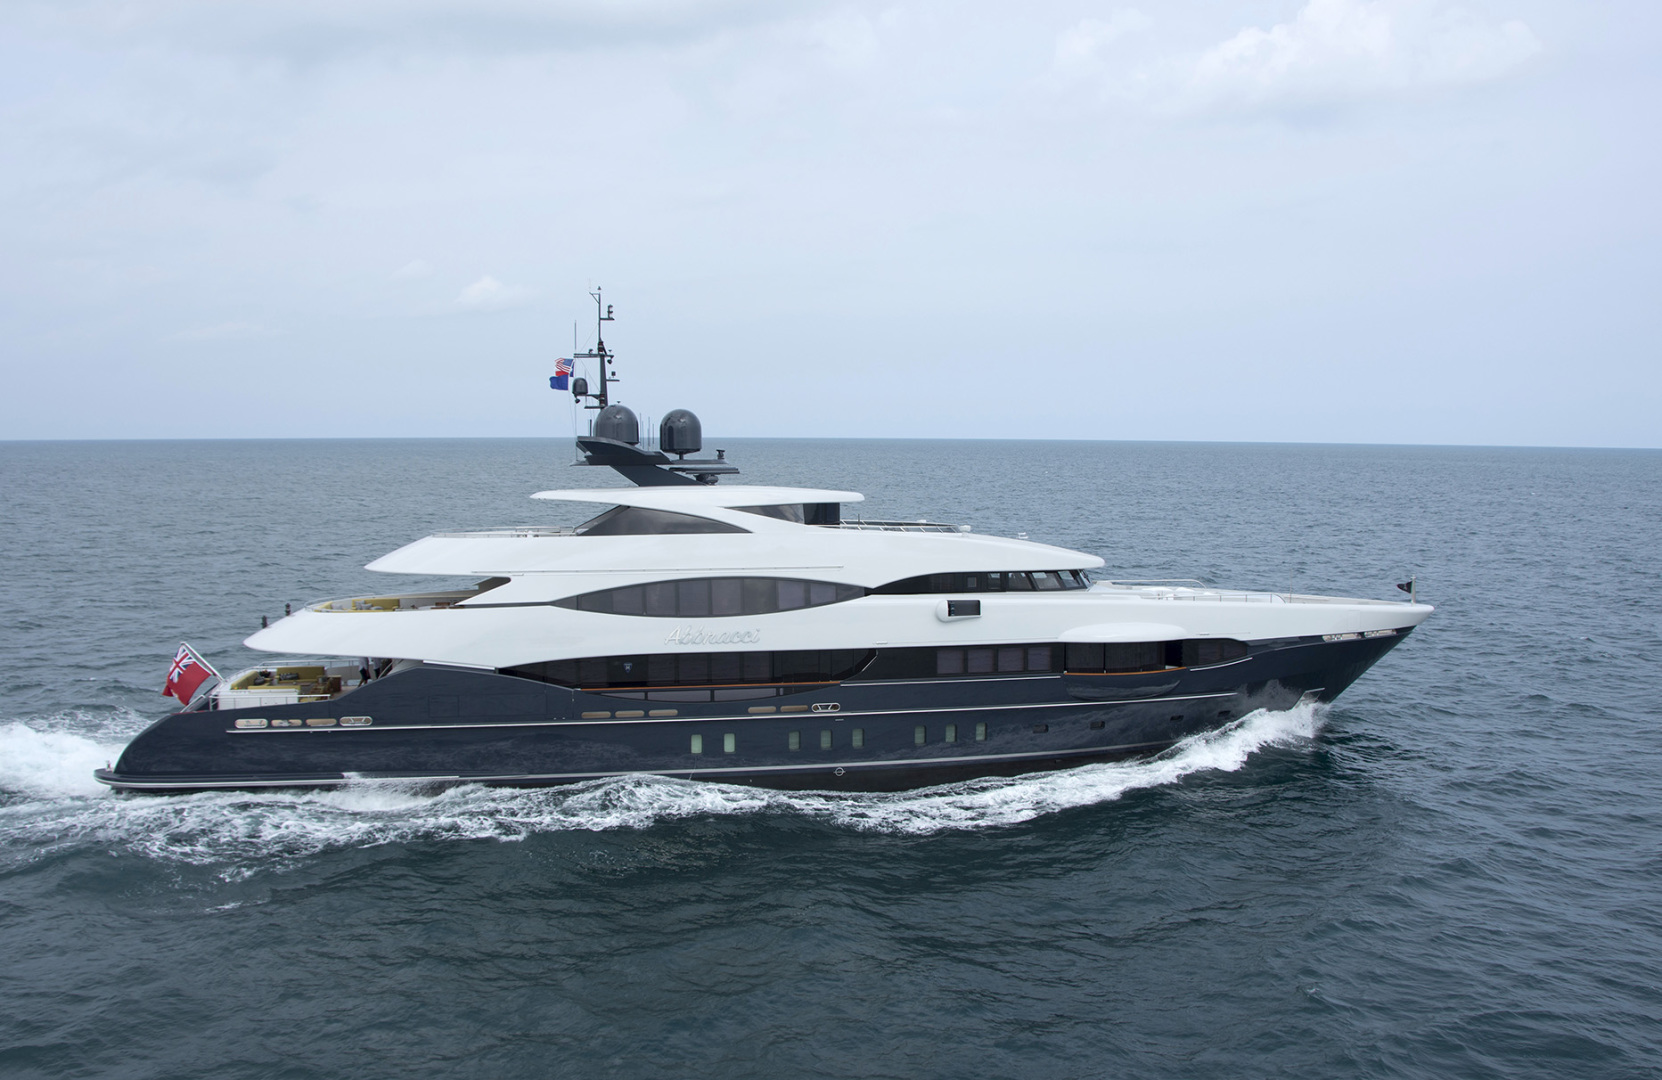 180' Heesen Yachts 2011 Lloyds, LY2/MCA Abbracci